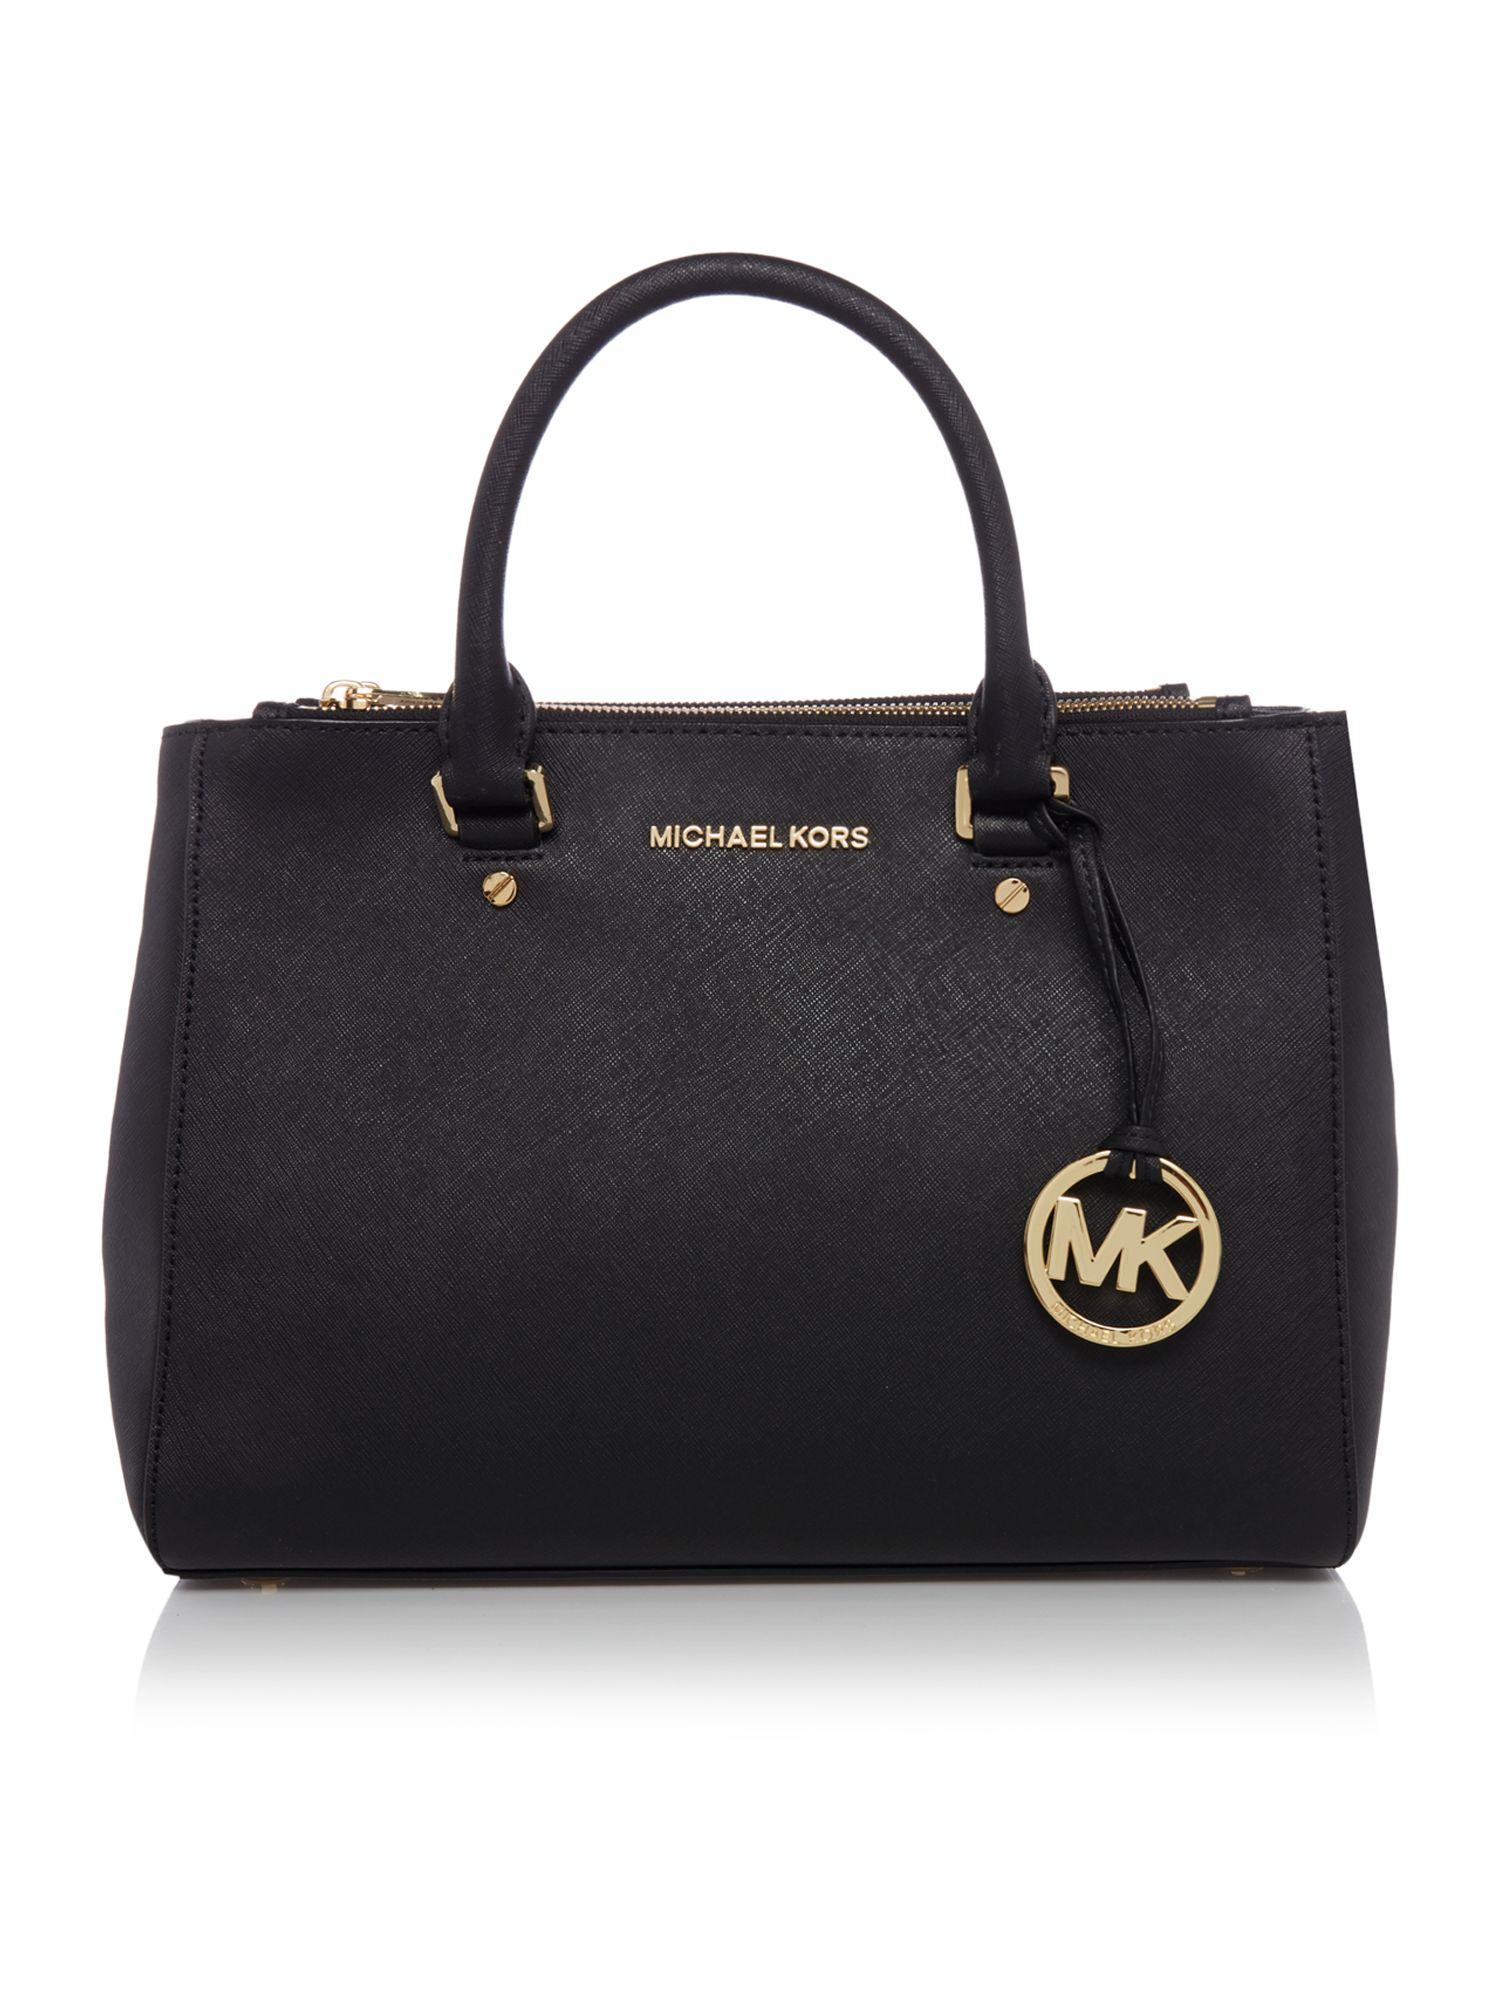 Michael Kors Sutton Medium Saffiano Leather Satchel Handbag in Black